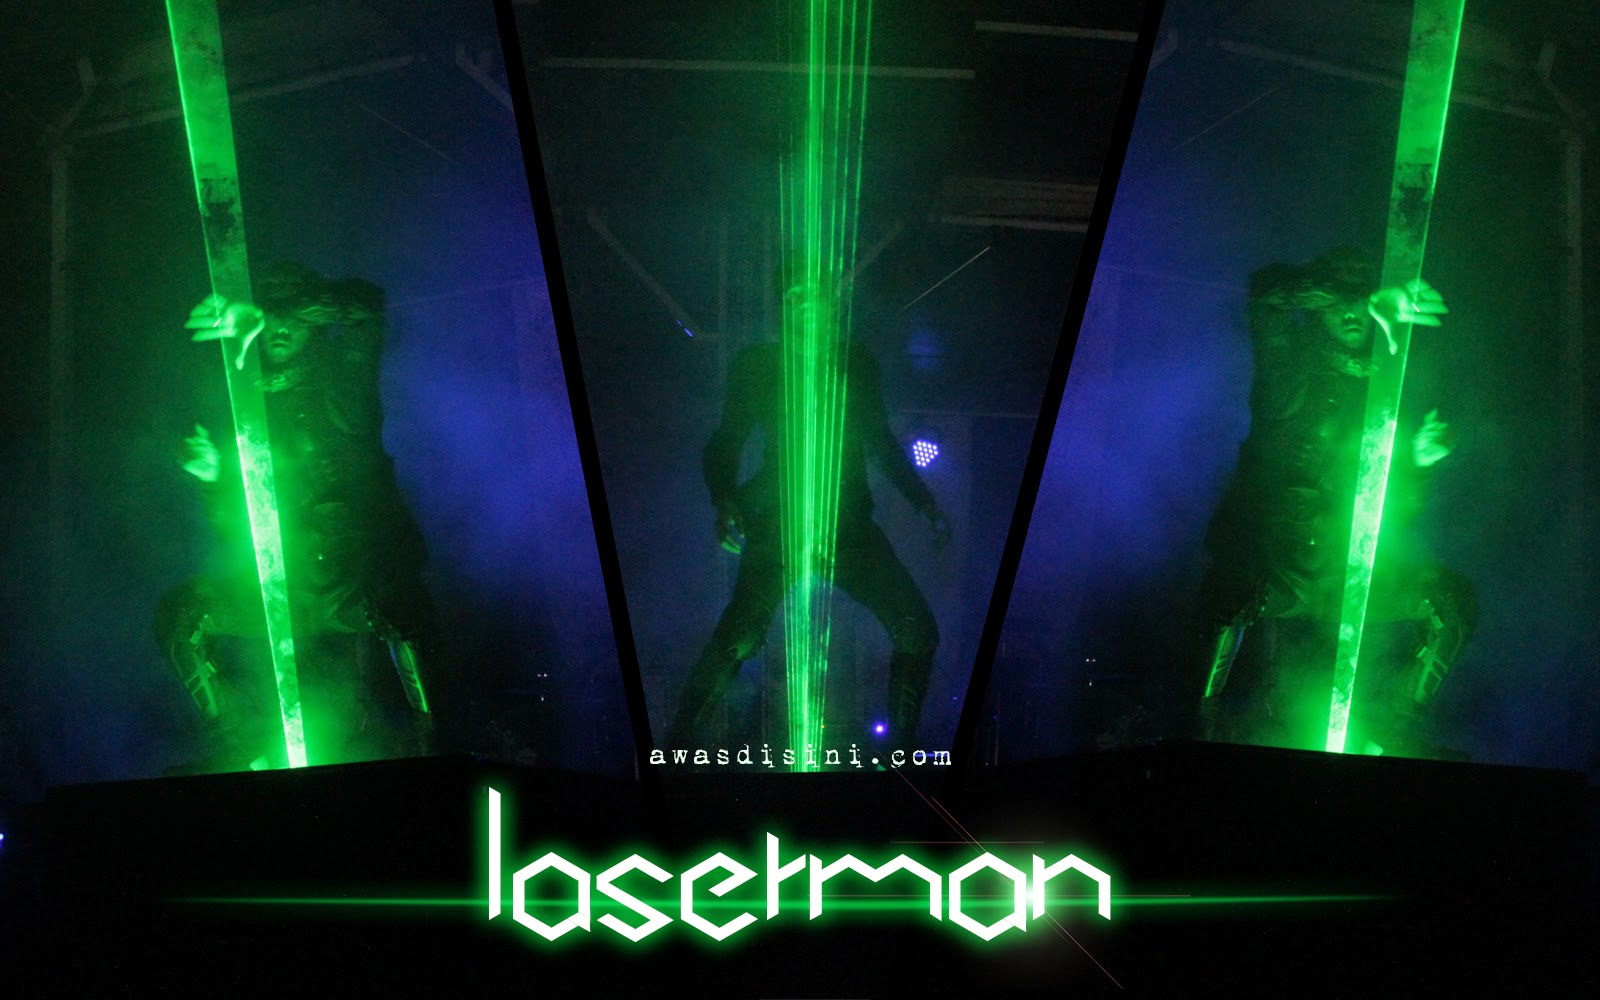 laserman Terbangkan Lampionmu Bersama Orang Tersayang di Fantasy Light Festival